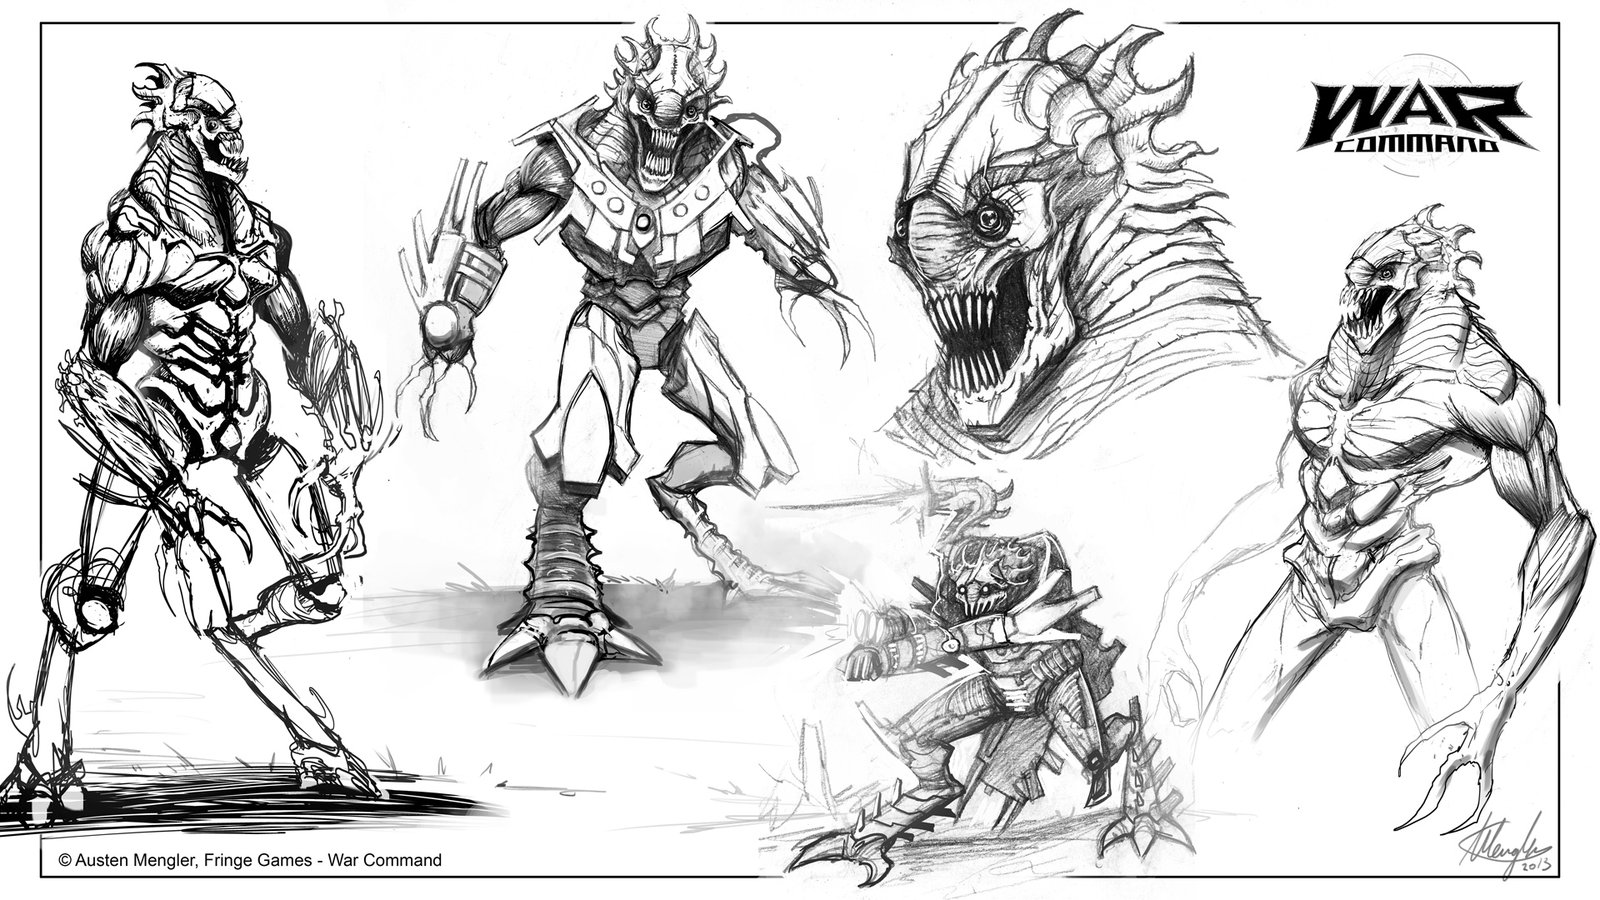 enhanced_delylian_warrior___concepts_by_lordnetsua-d65nqsm.jpg